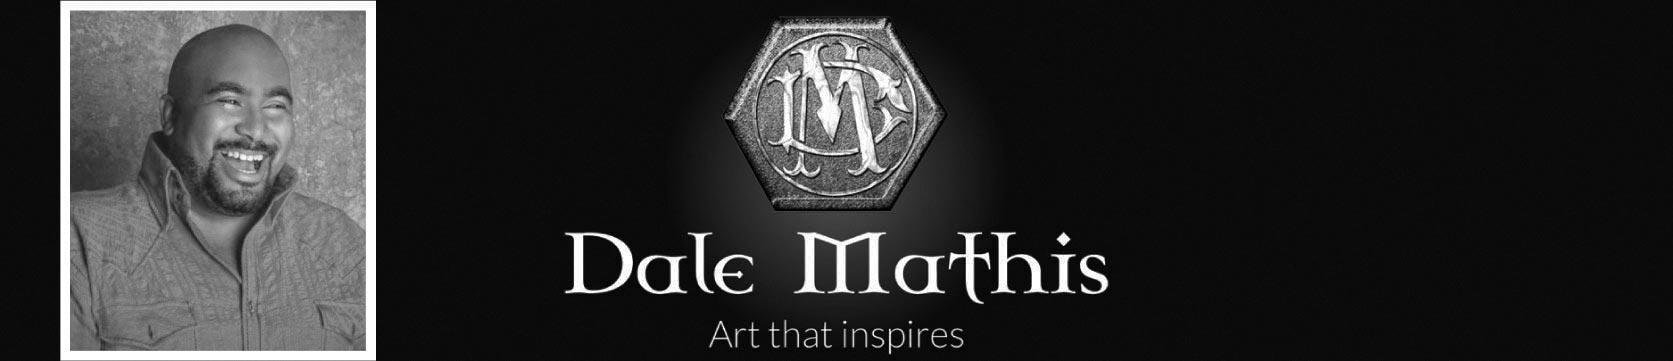 Dale Mathis Artist